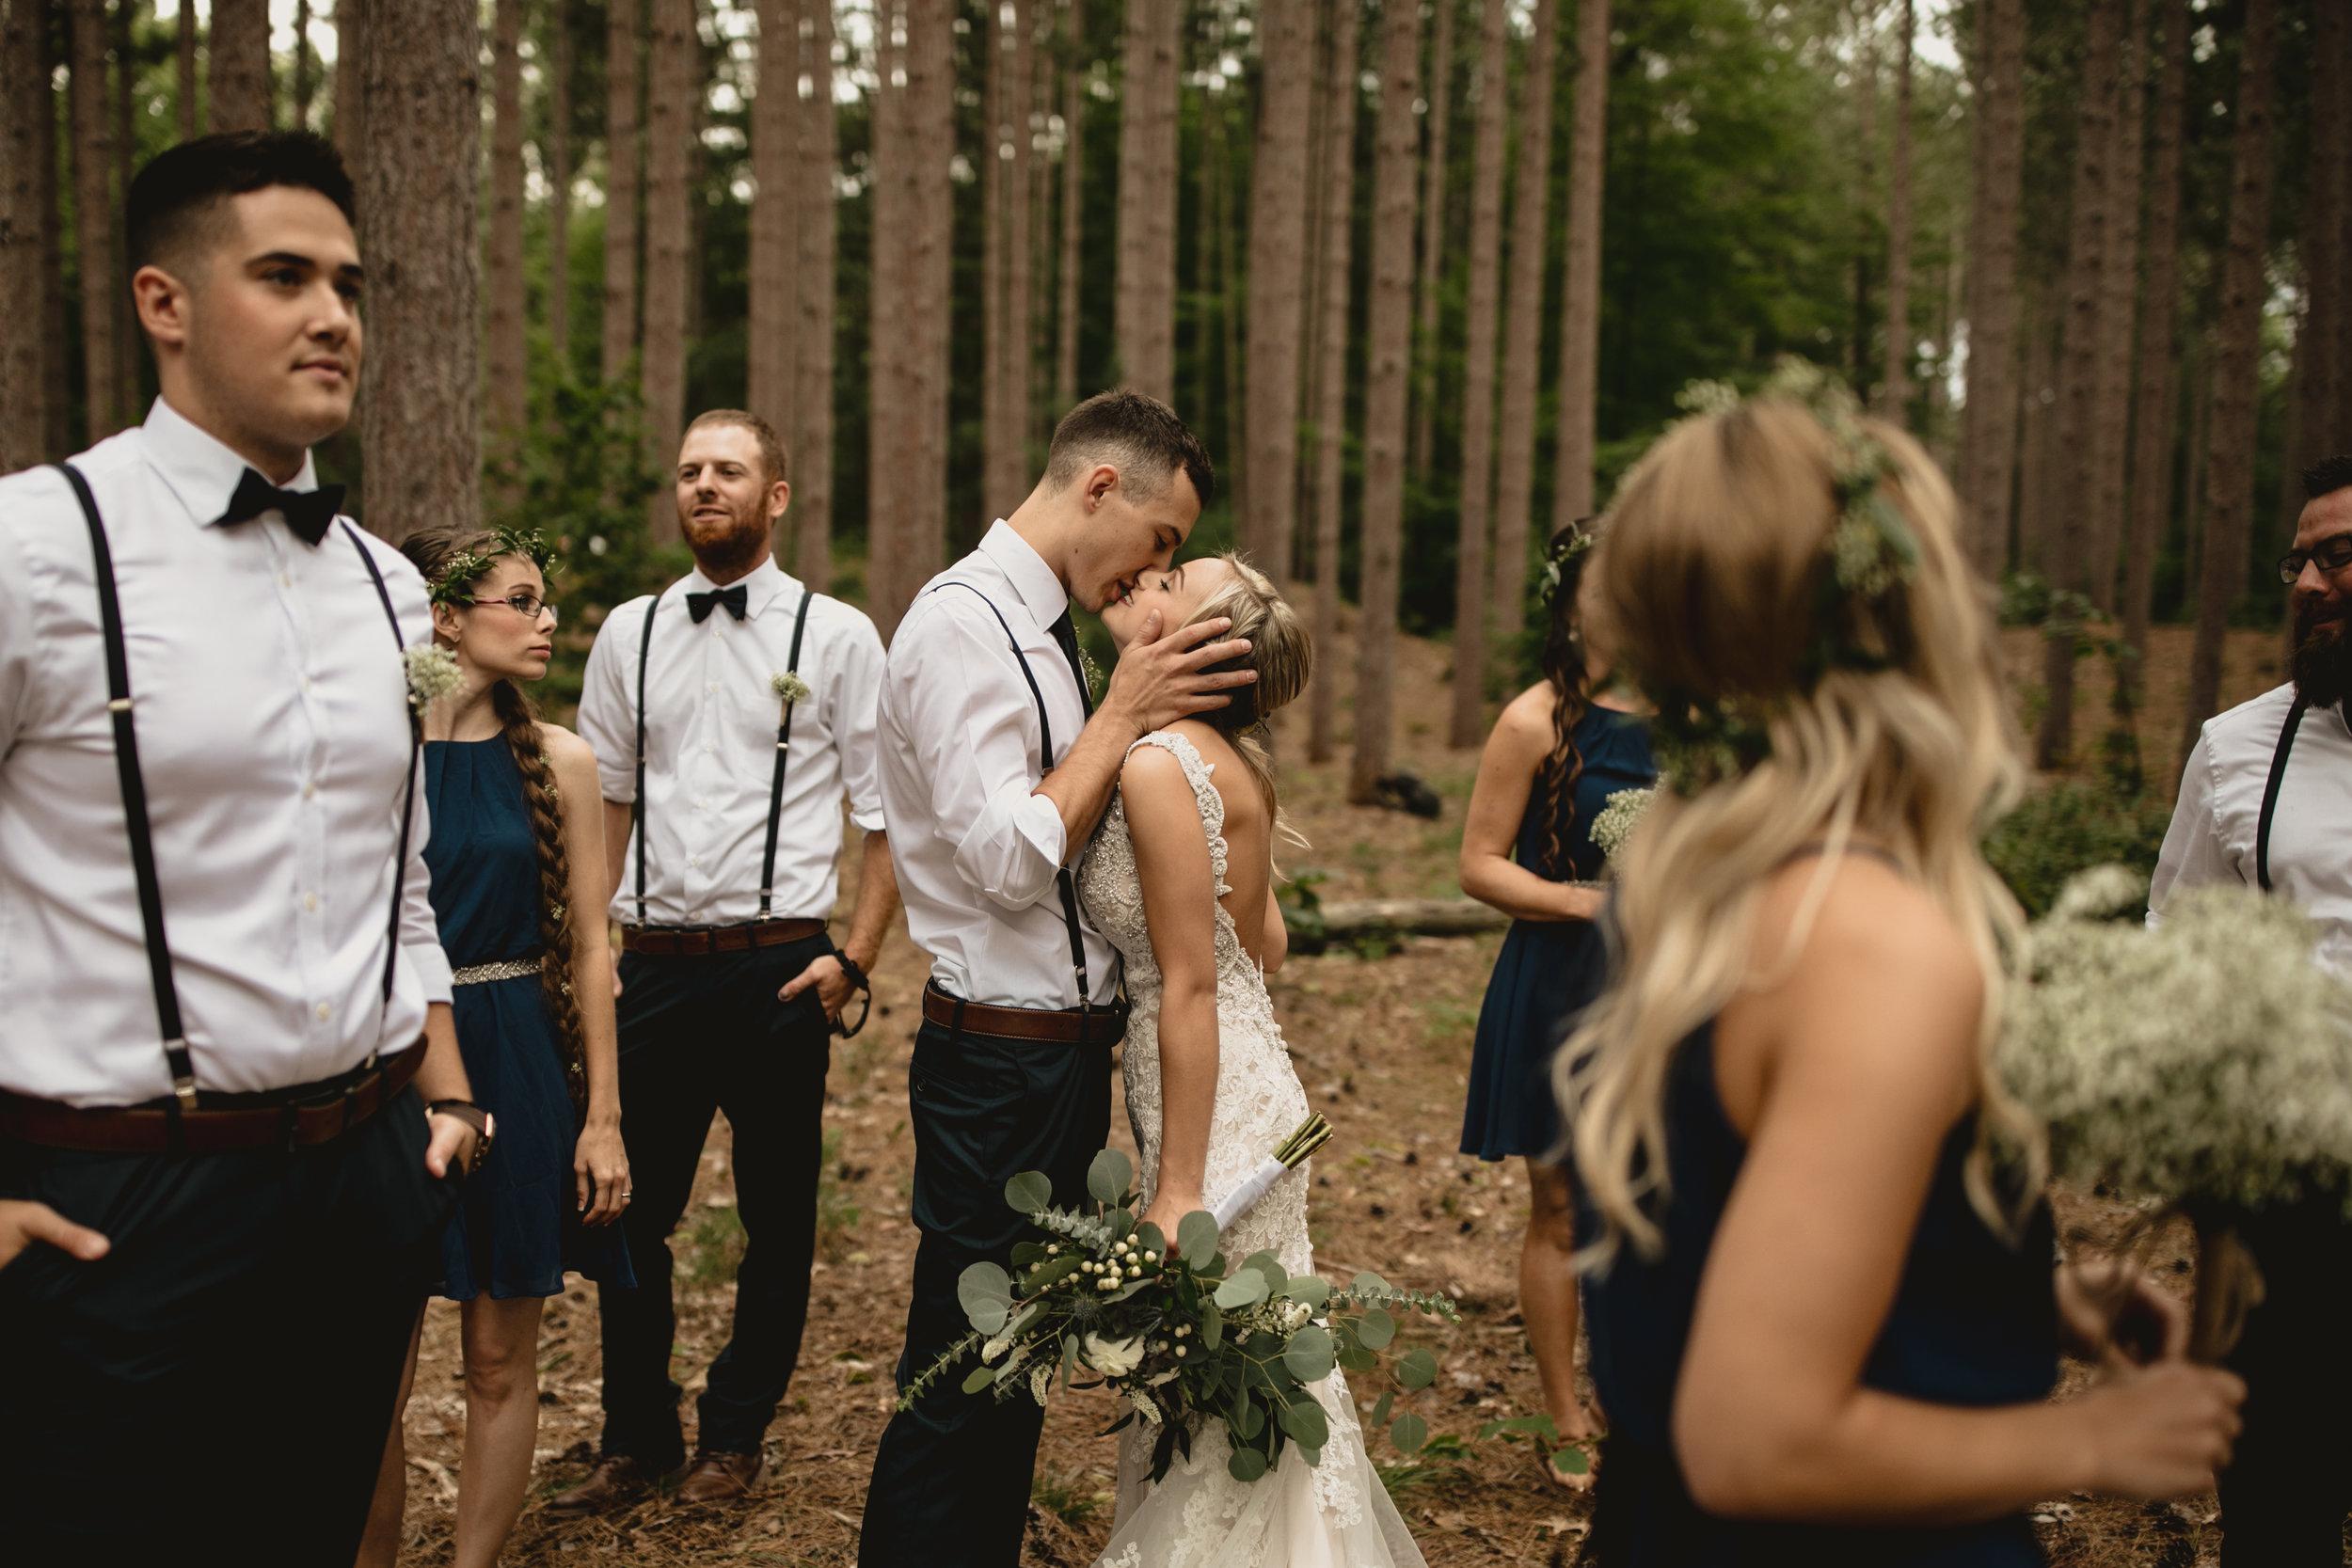 west-michigan-wedding-photographer-whitehall-rachel-austin-chapel-in-the-pines-466.jpg